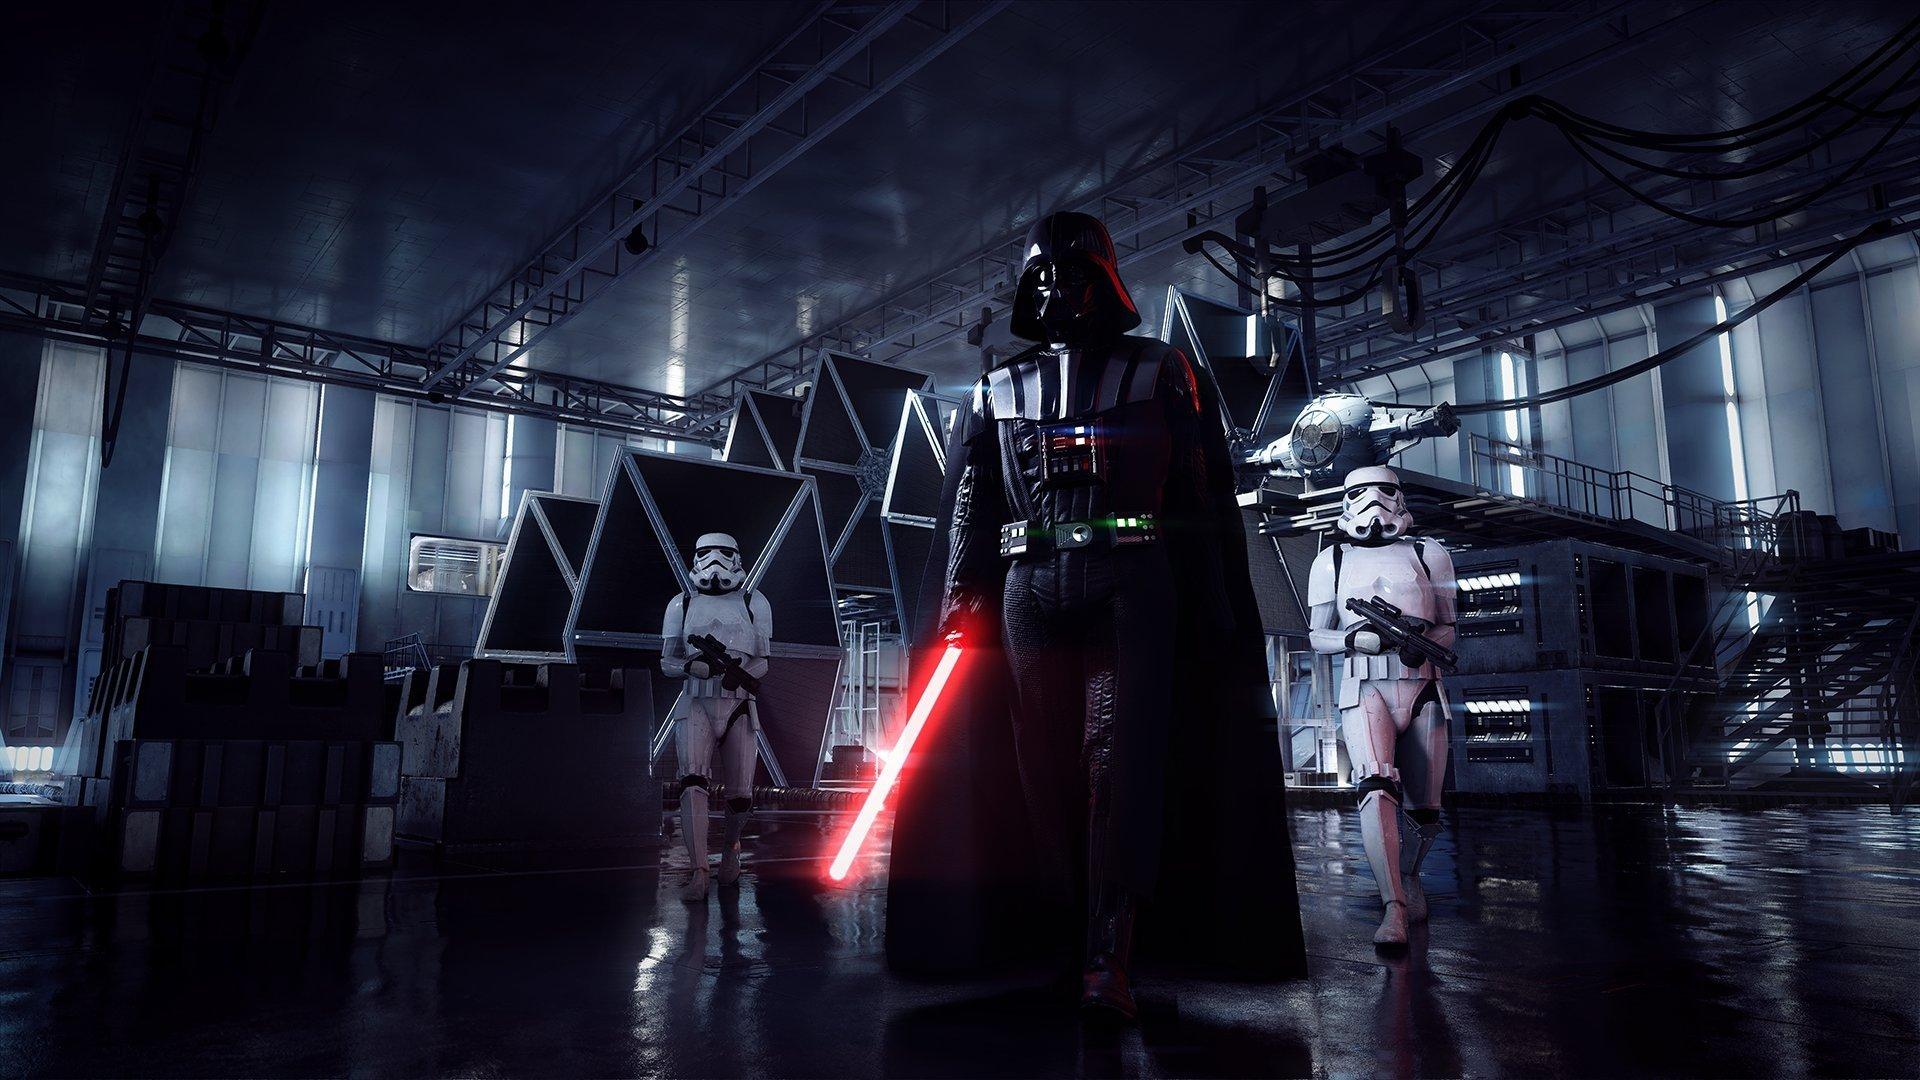 Conférence de presse E3 2019 : Electronic Arts saute la conférence de presse